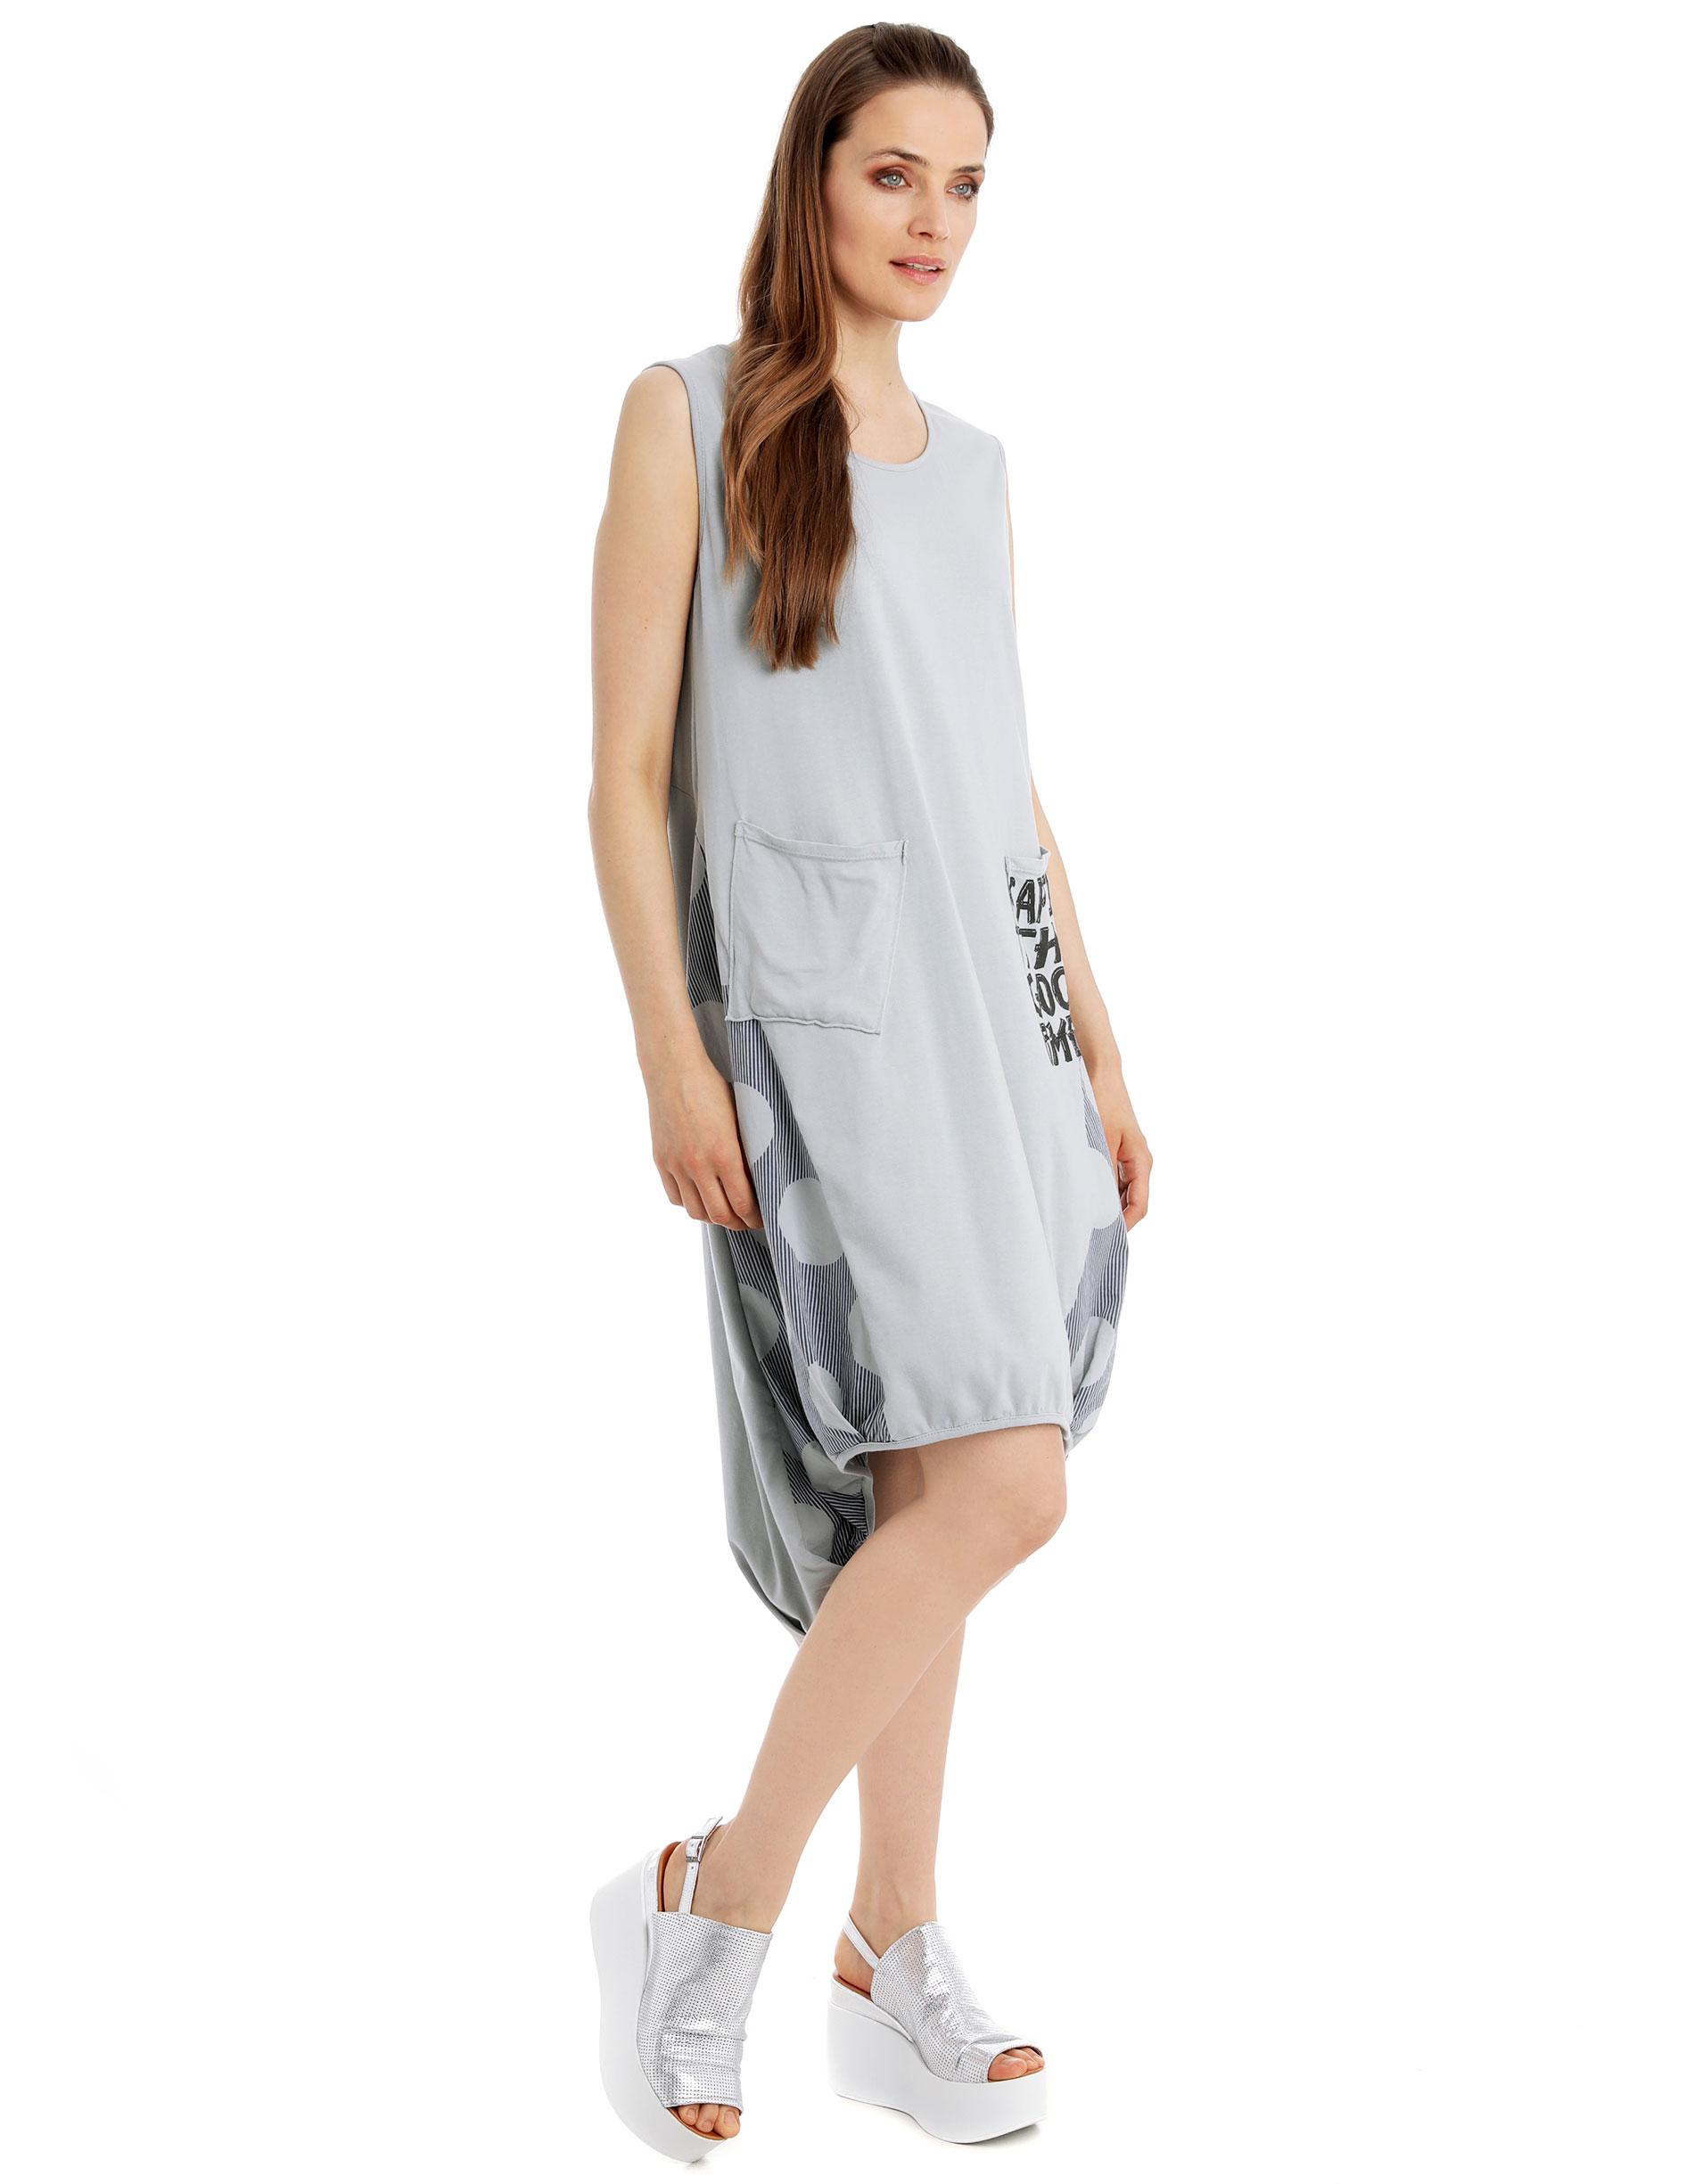 Sukienka - 120-1469 GRIG - Unisono